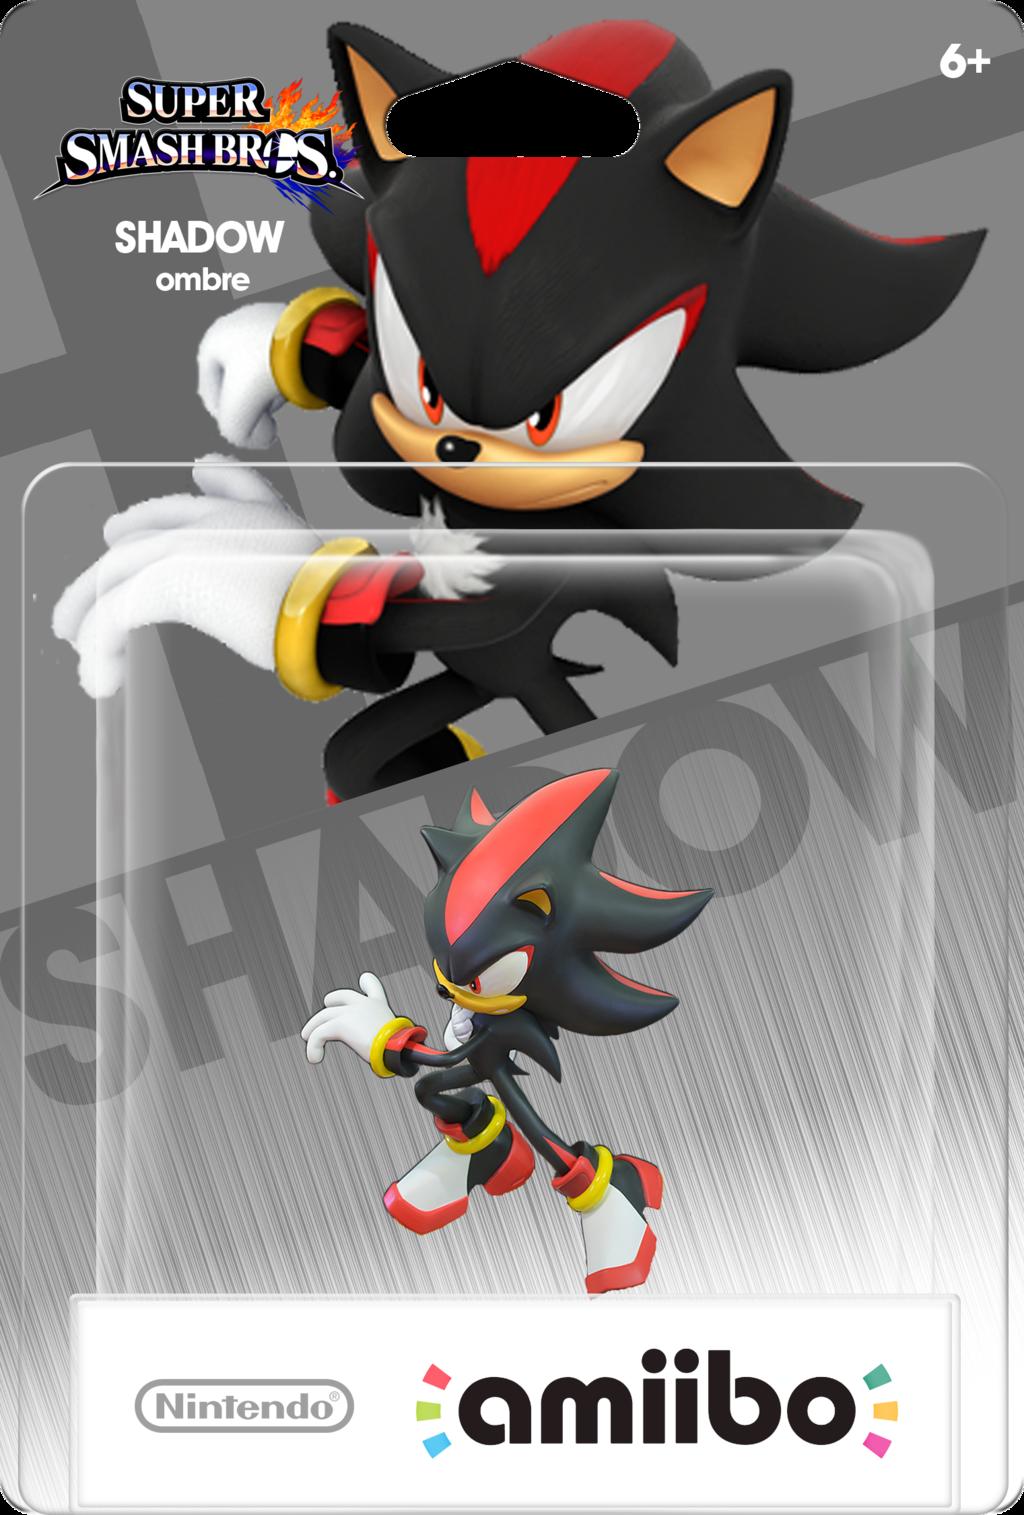 Yeeeeeeees Nintendo Amiibo Amiibo Sonic Birthday